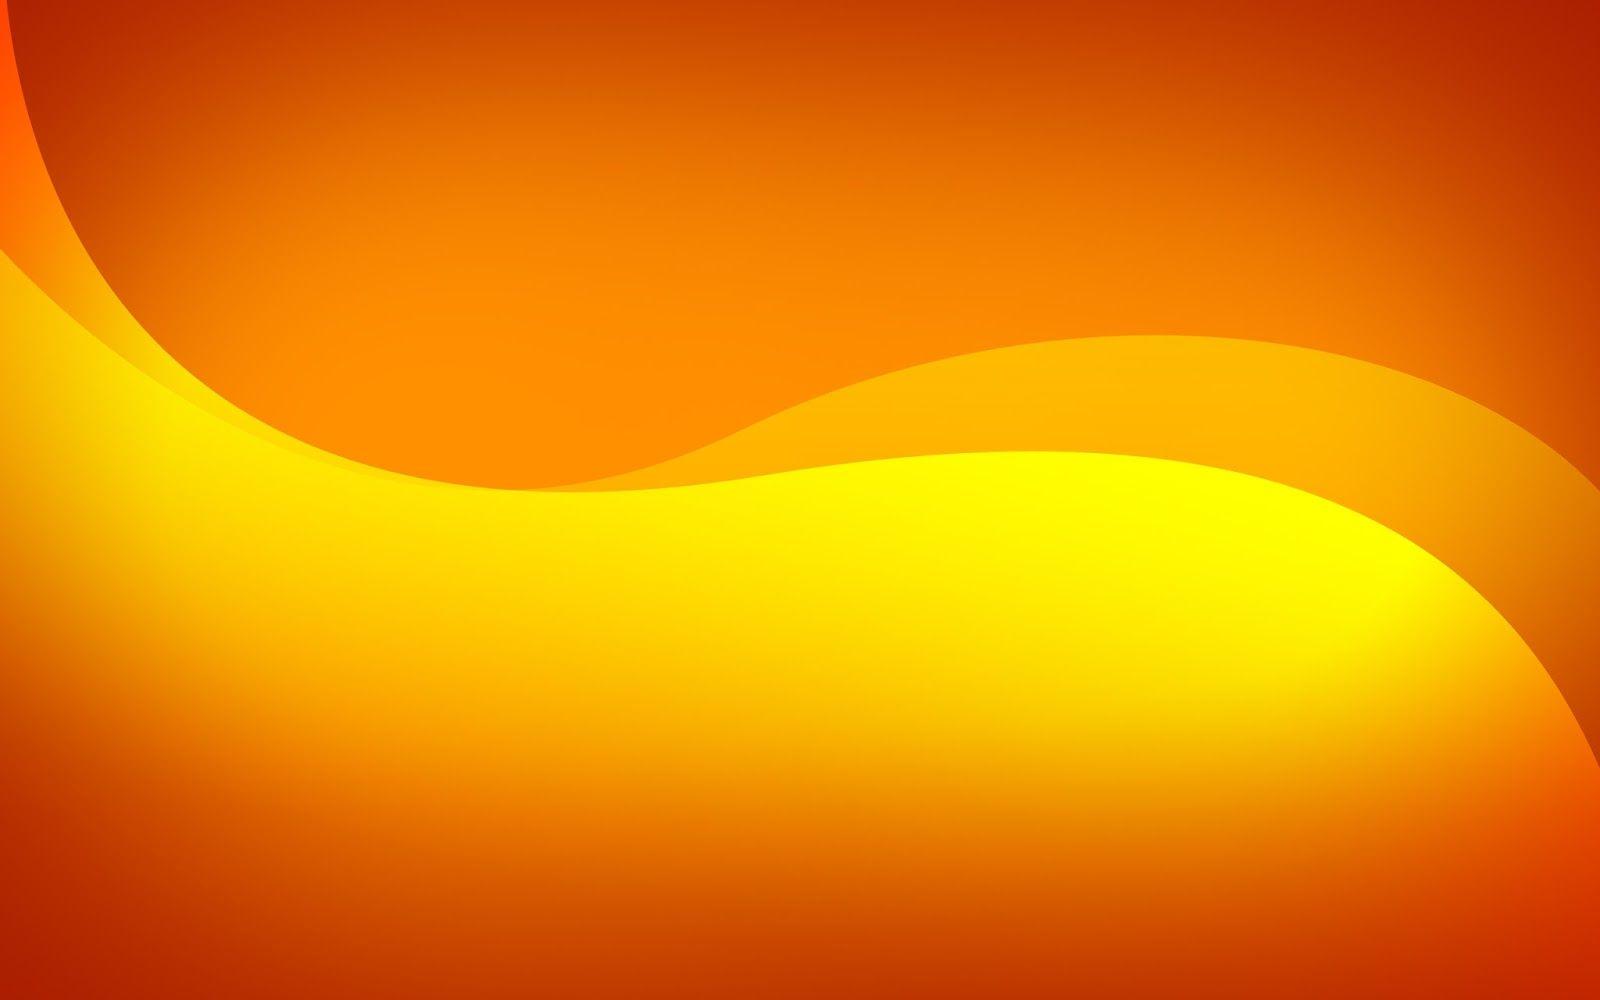 ImageTopia: Wallpapers Amarillos Y Naranjas.